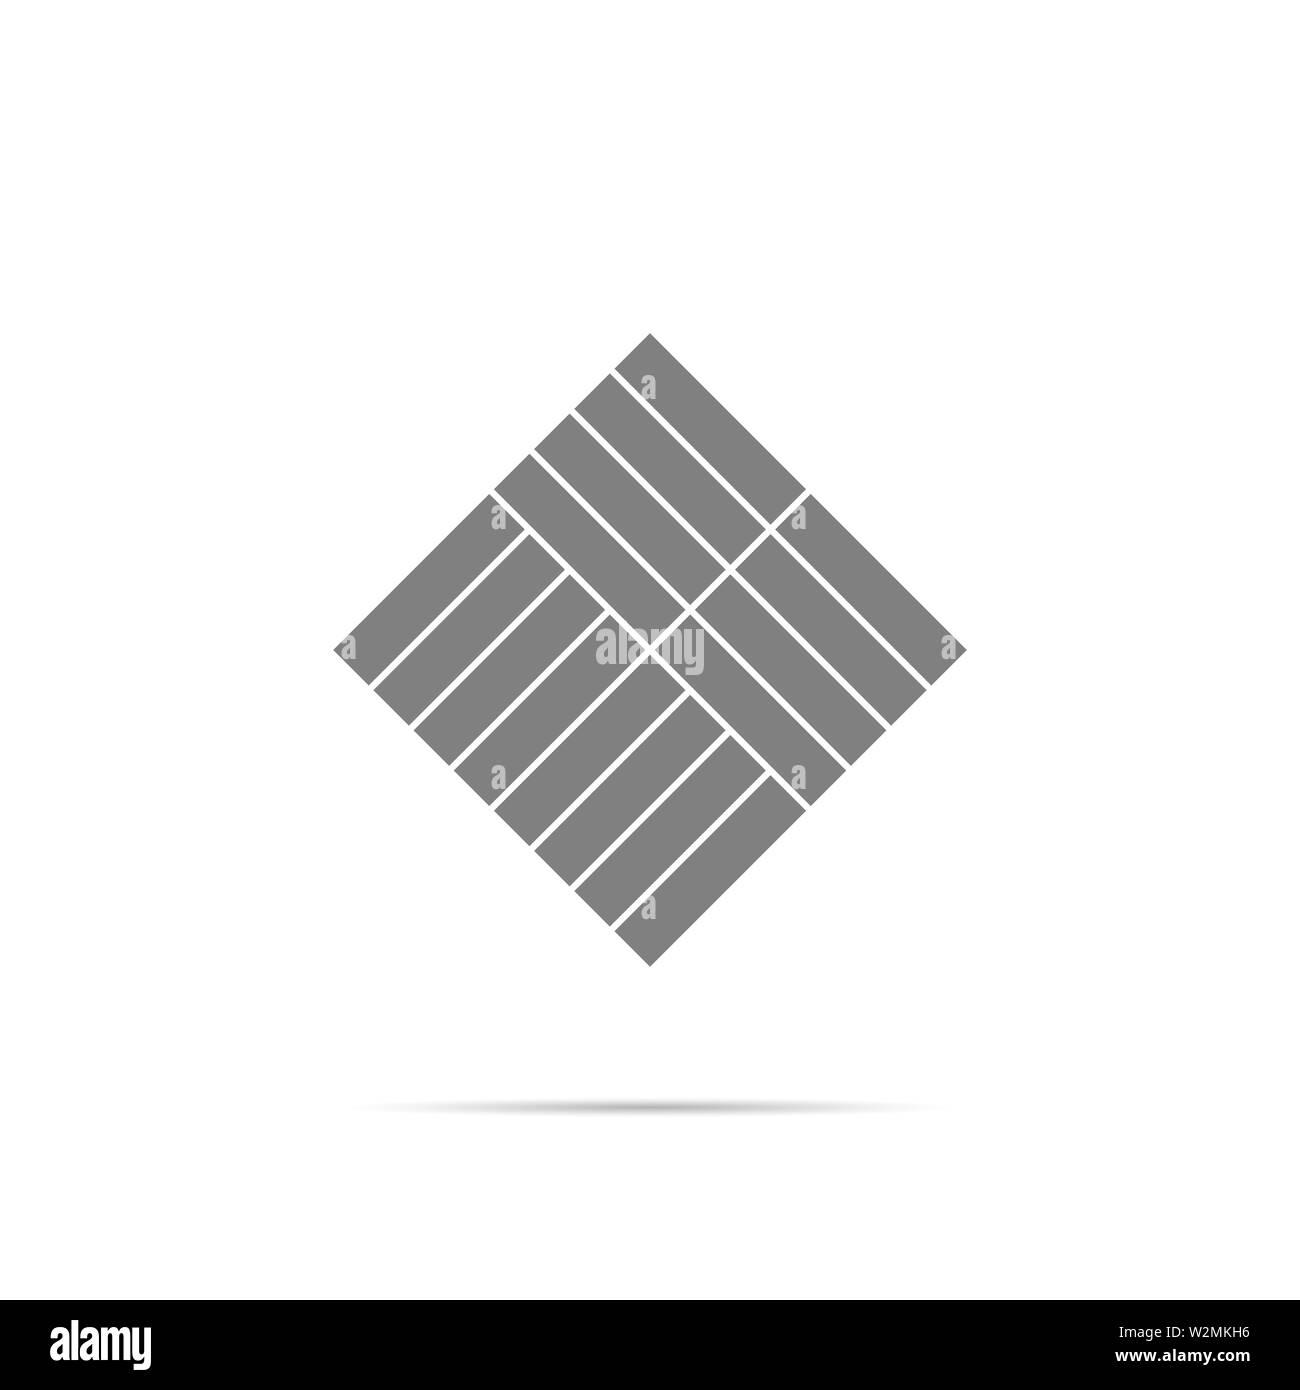 Parquet icon symbol with shadow. Vector eps10 - Stock Image